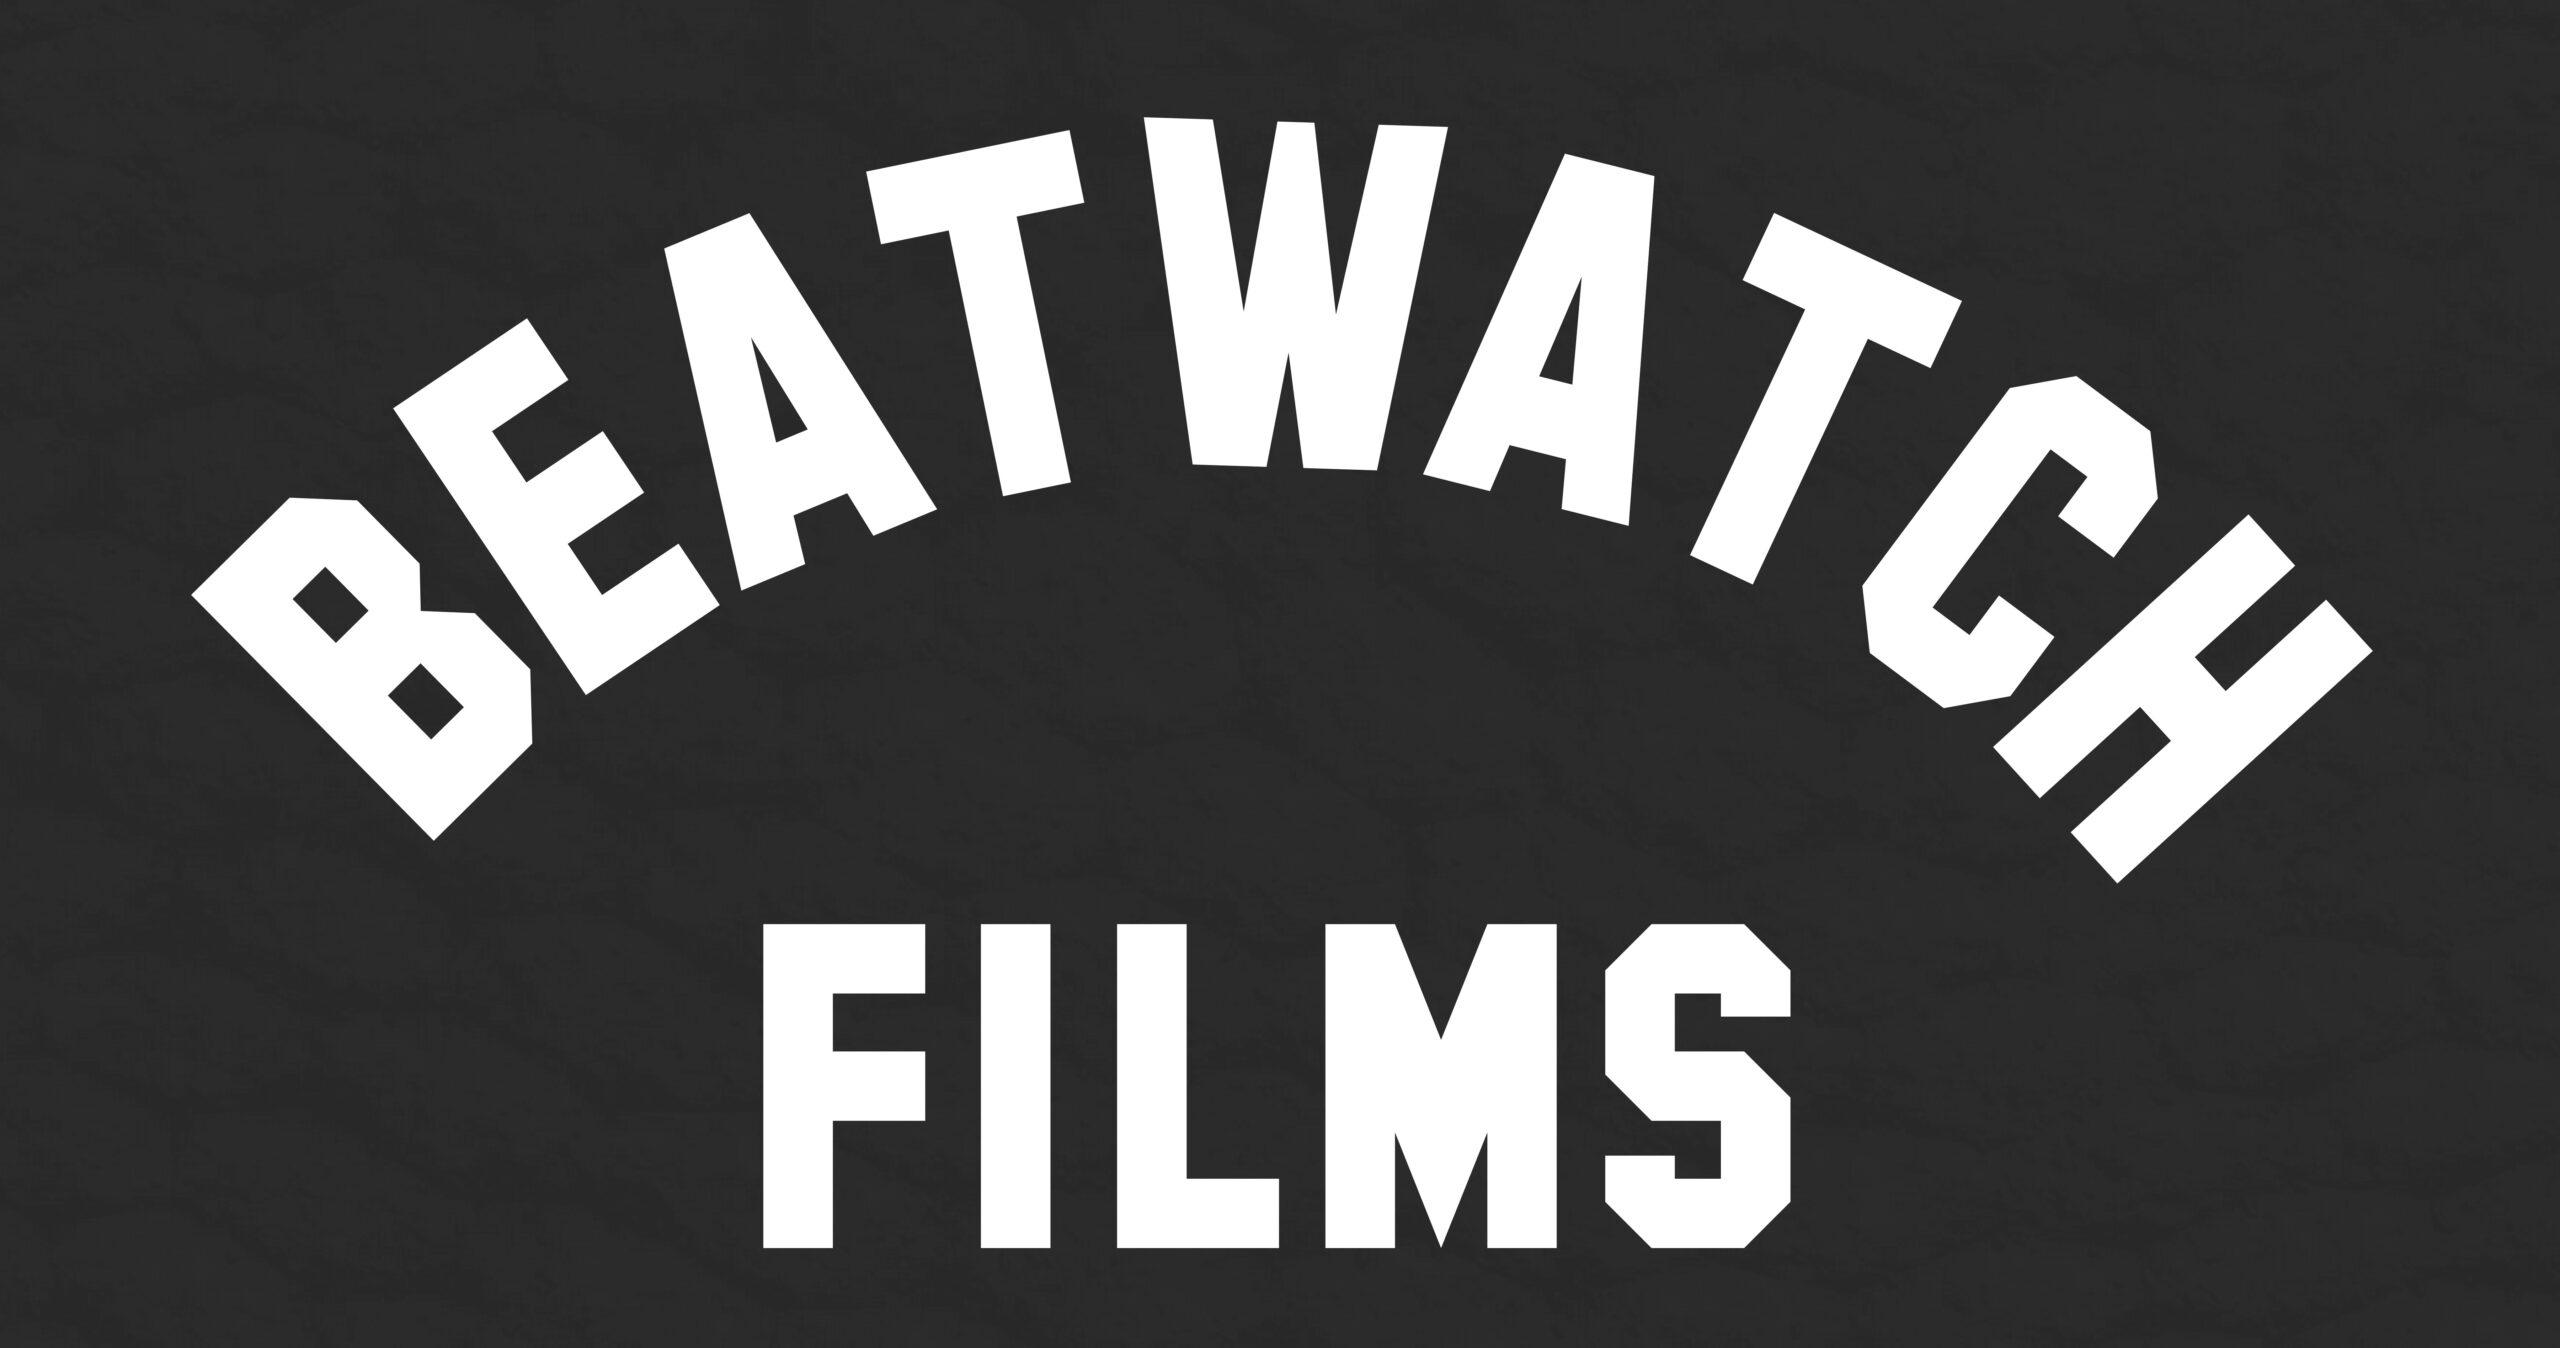 BEATWATCH FILMS -